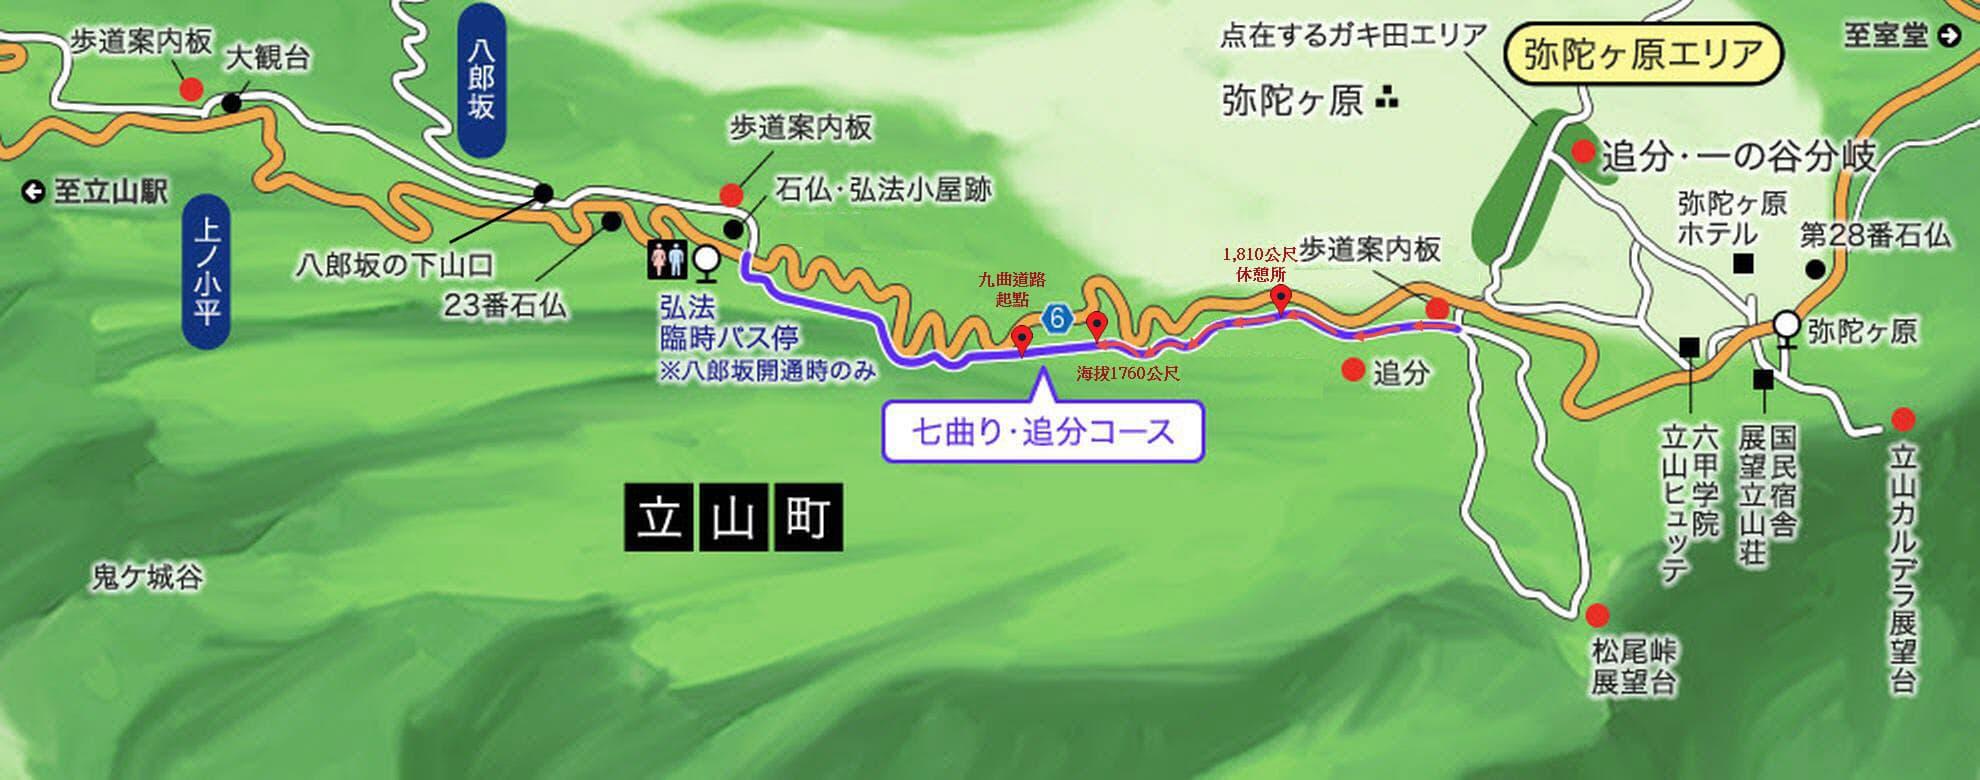 立山 弘法・追分コース 健行道